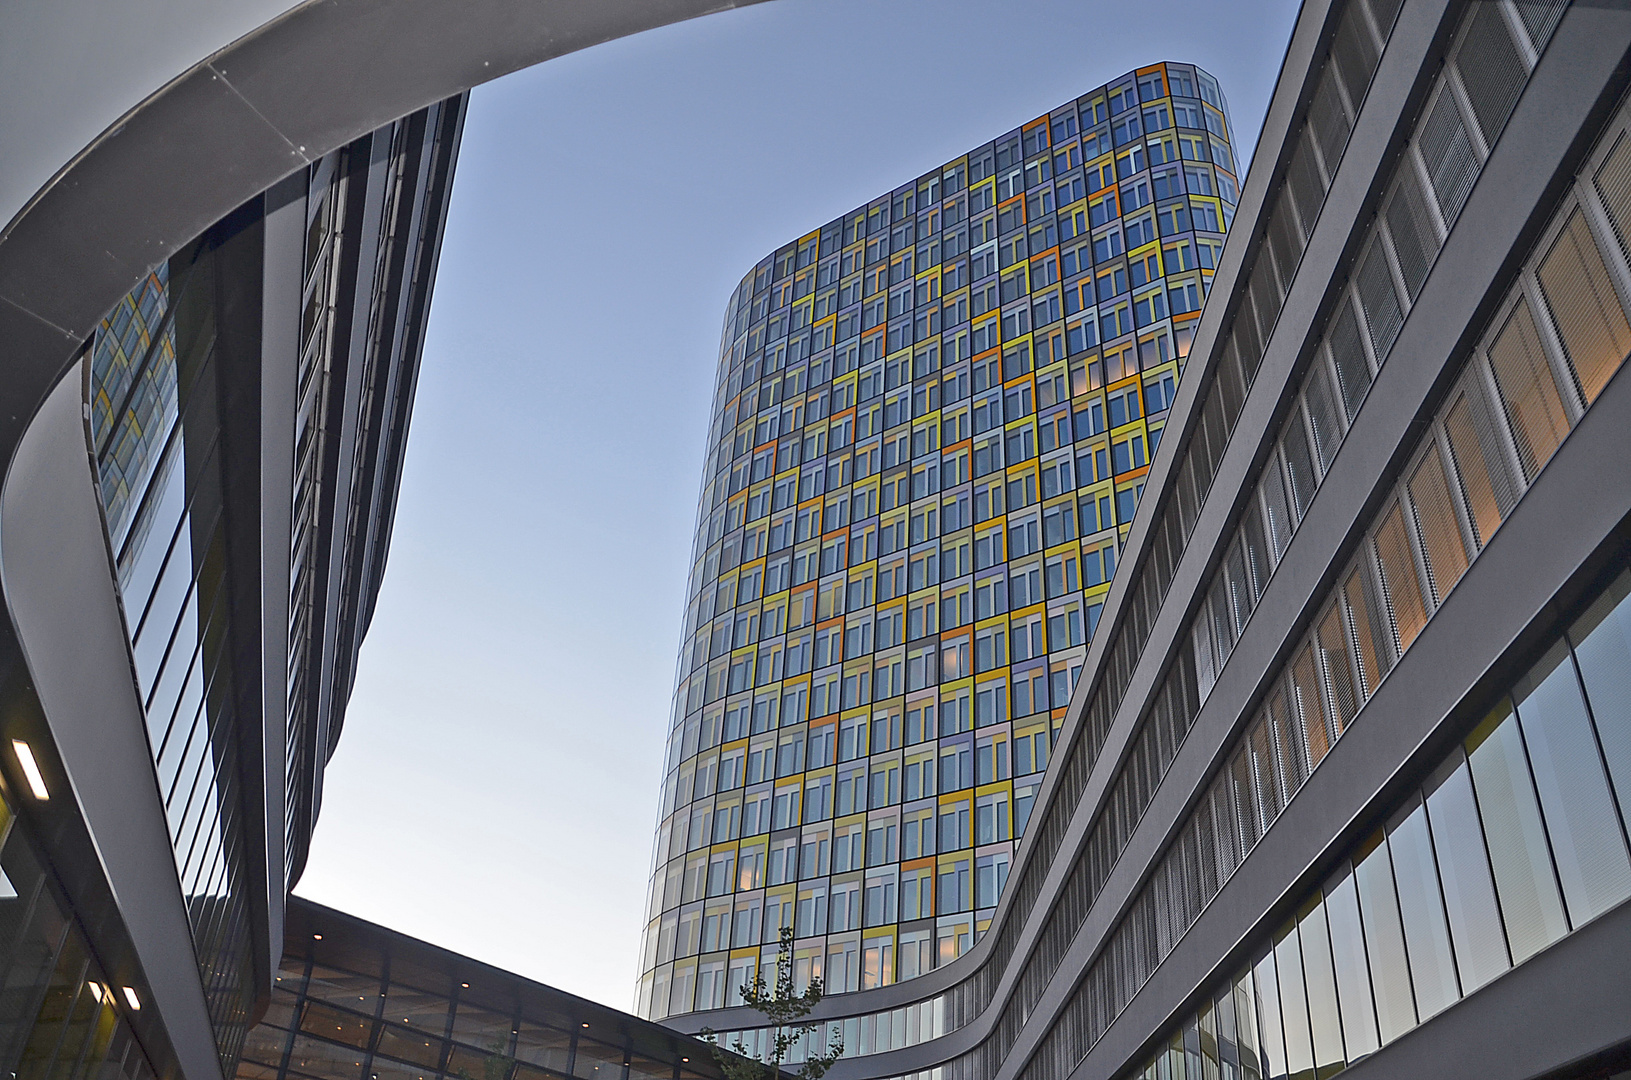 Moderne Architektur In Hannover Foto Bild: Moderne Architektur In München Foto & Bild